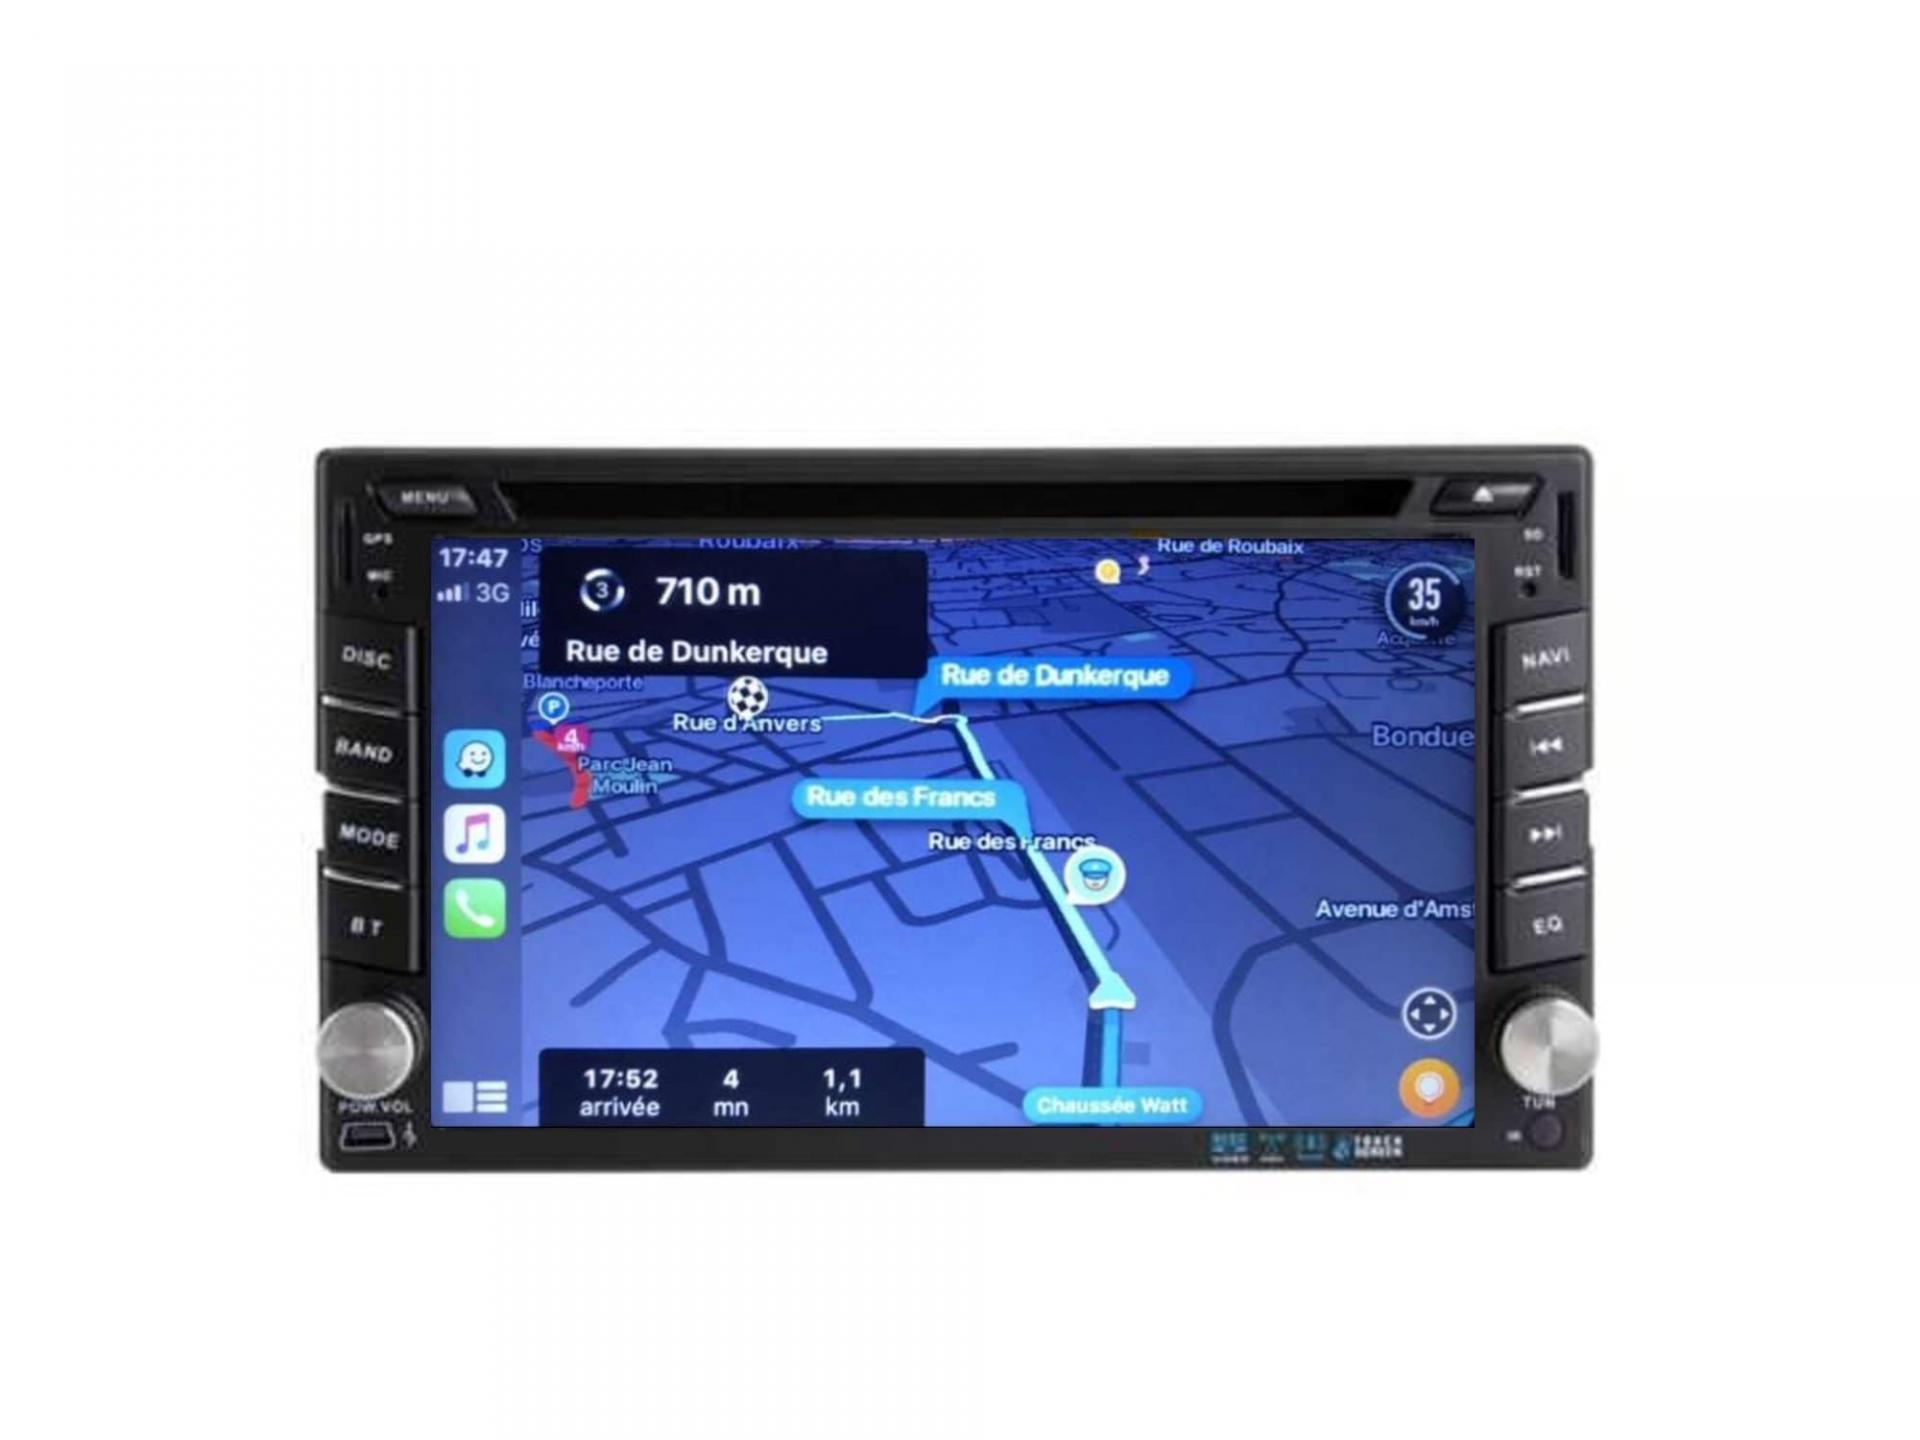 Autoradio gps carplay android auto bluetooth vw golf 4 polo passat bora sharan t4 t5 crafter transporter 17